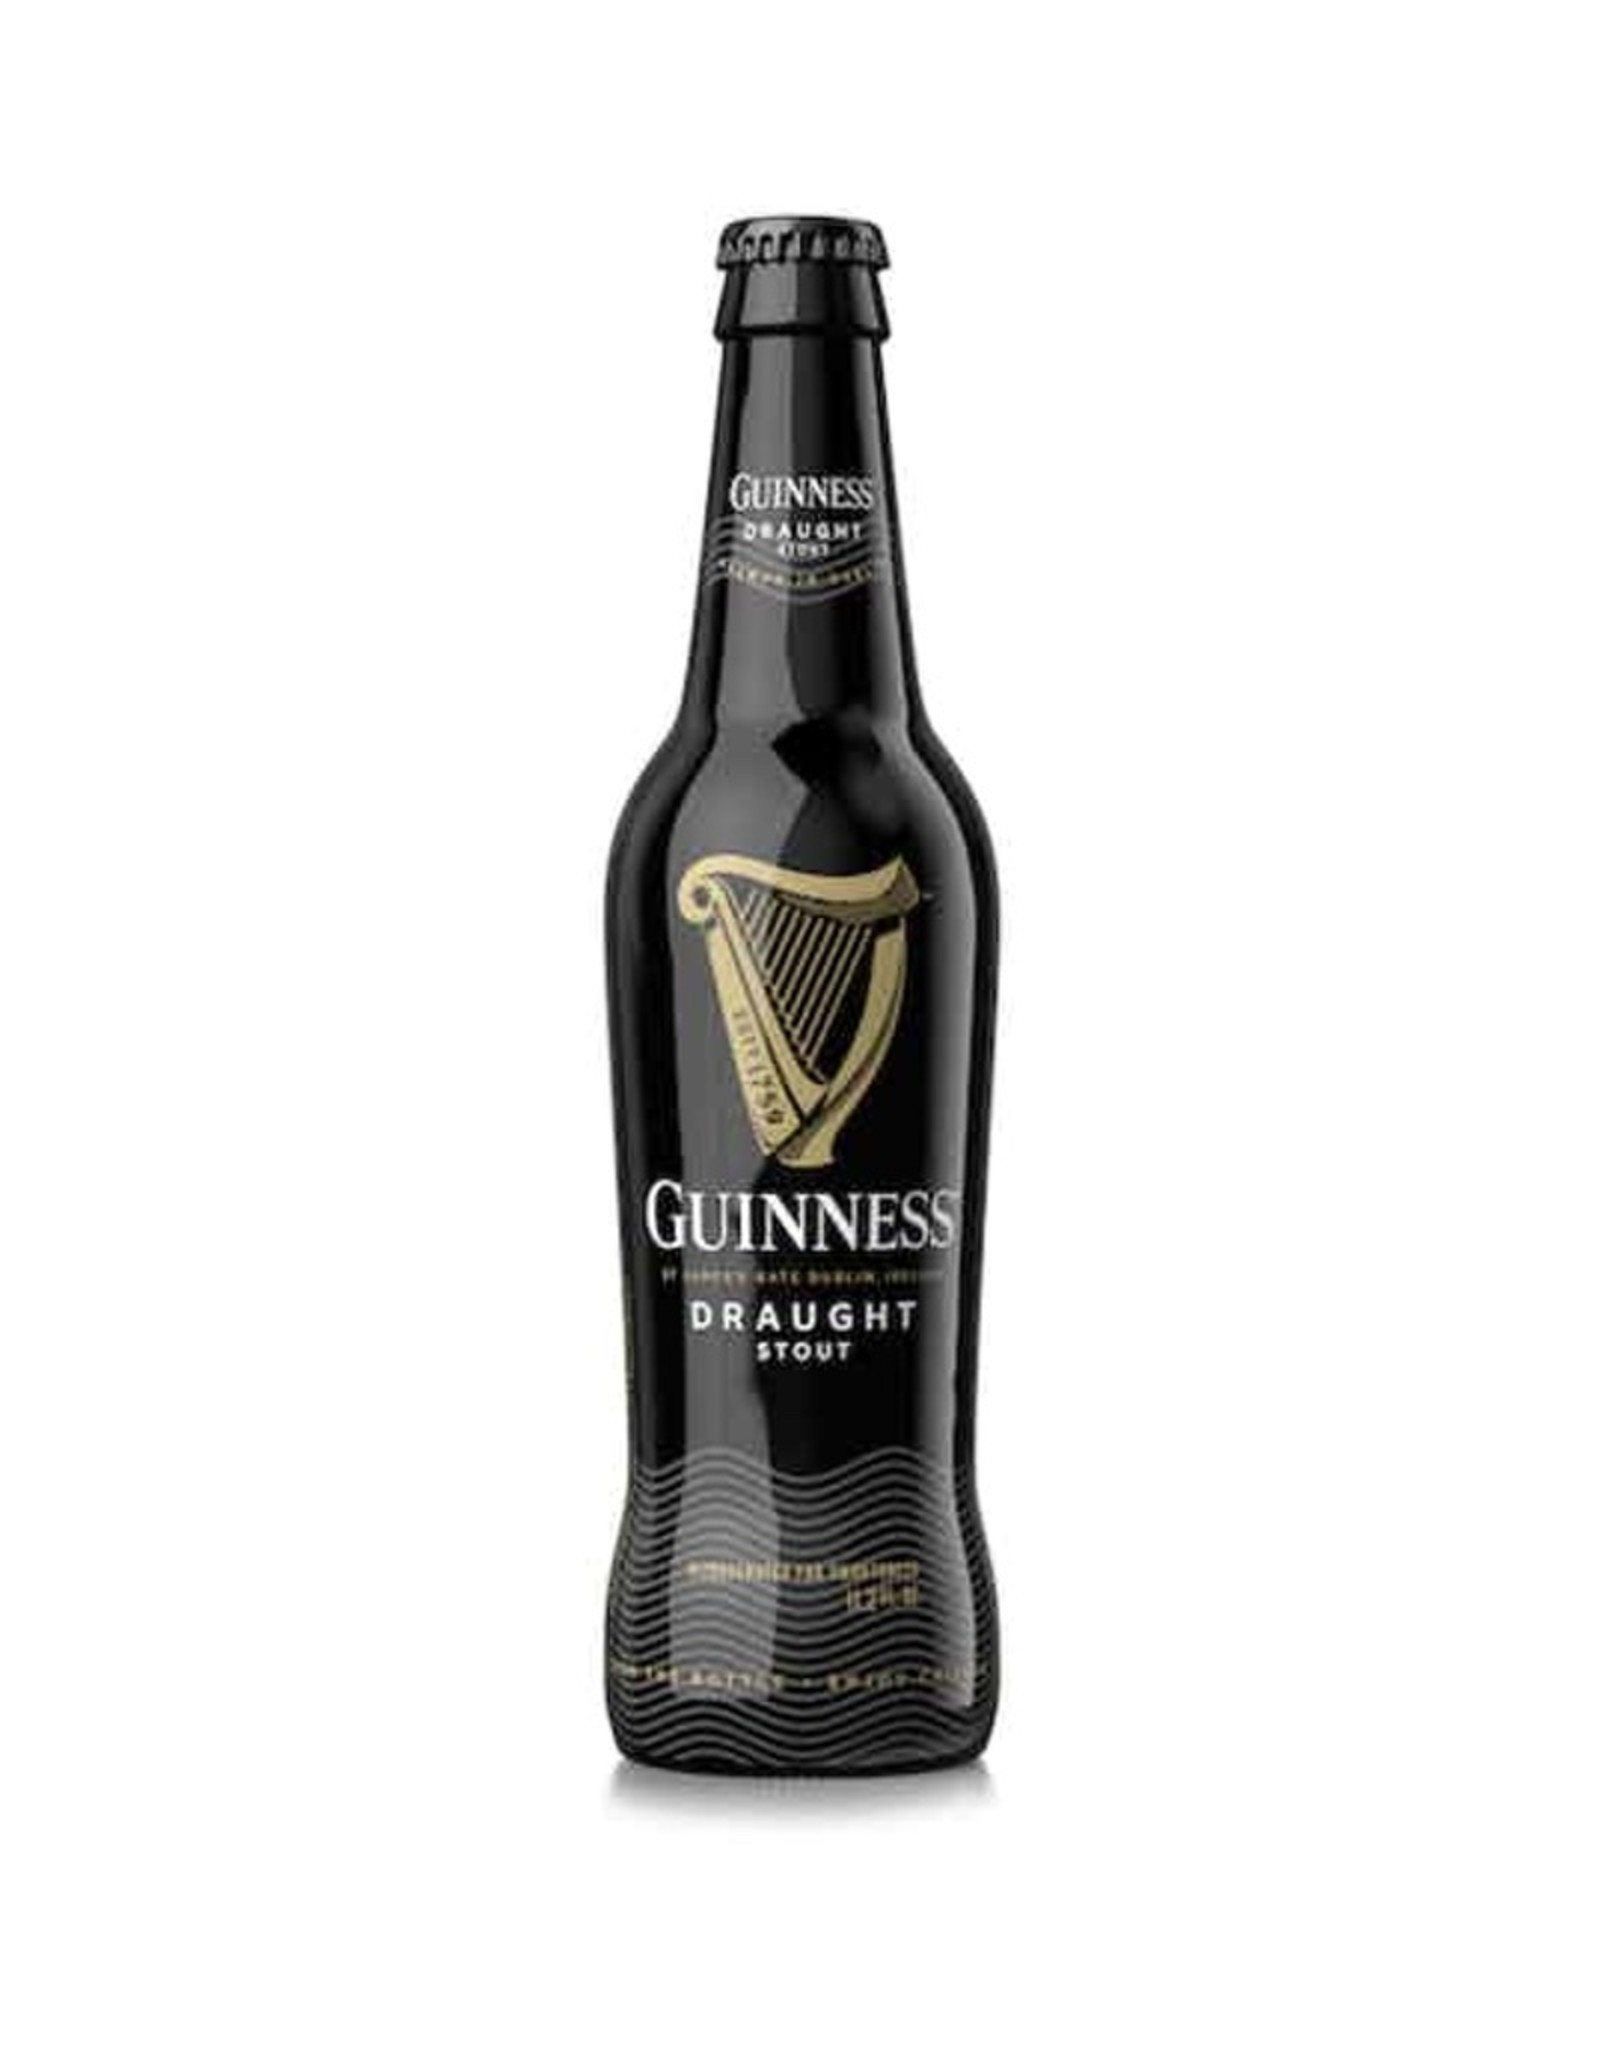 Guinness Drought Stout